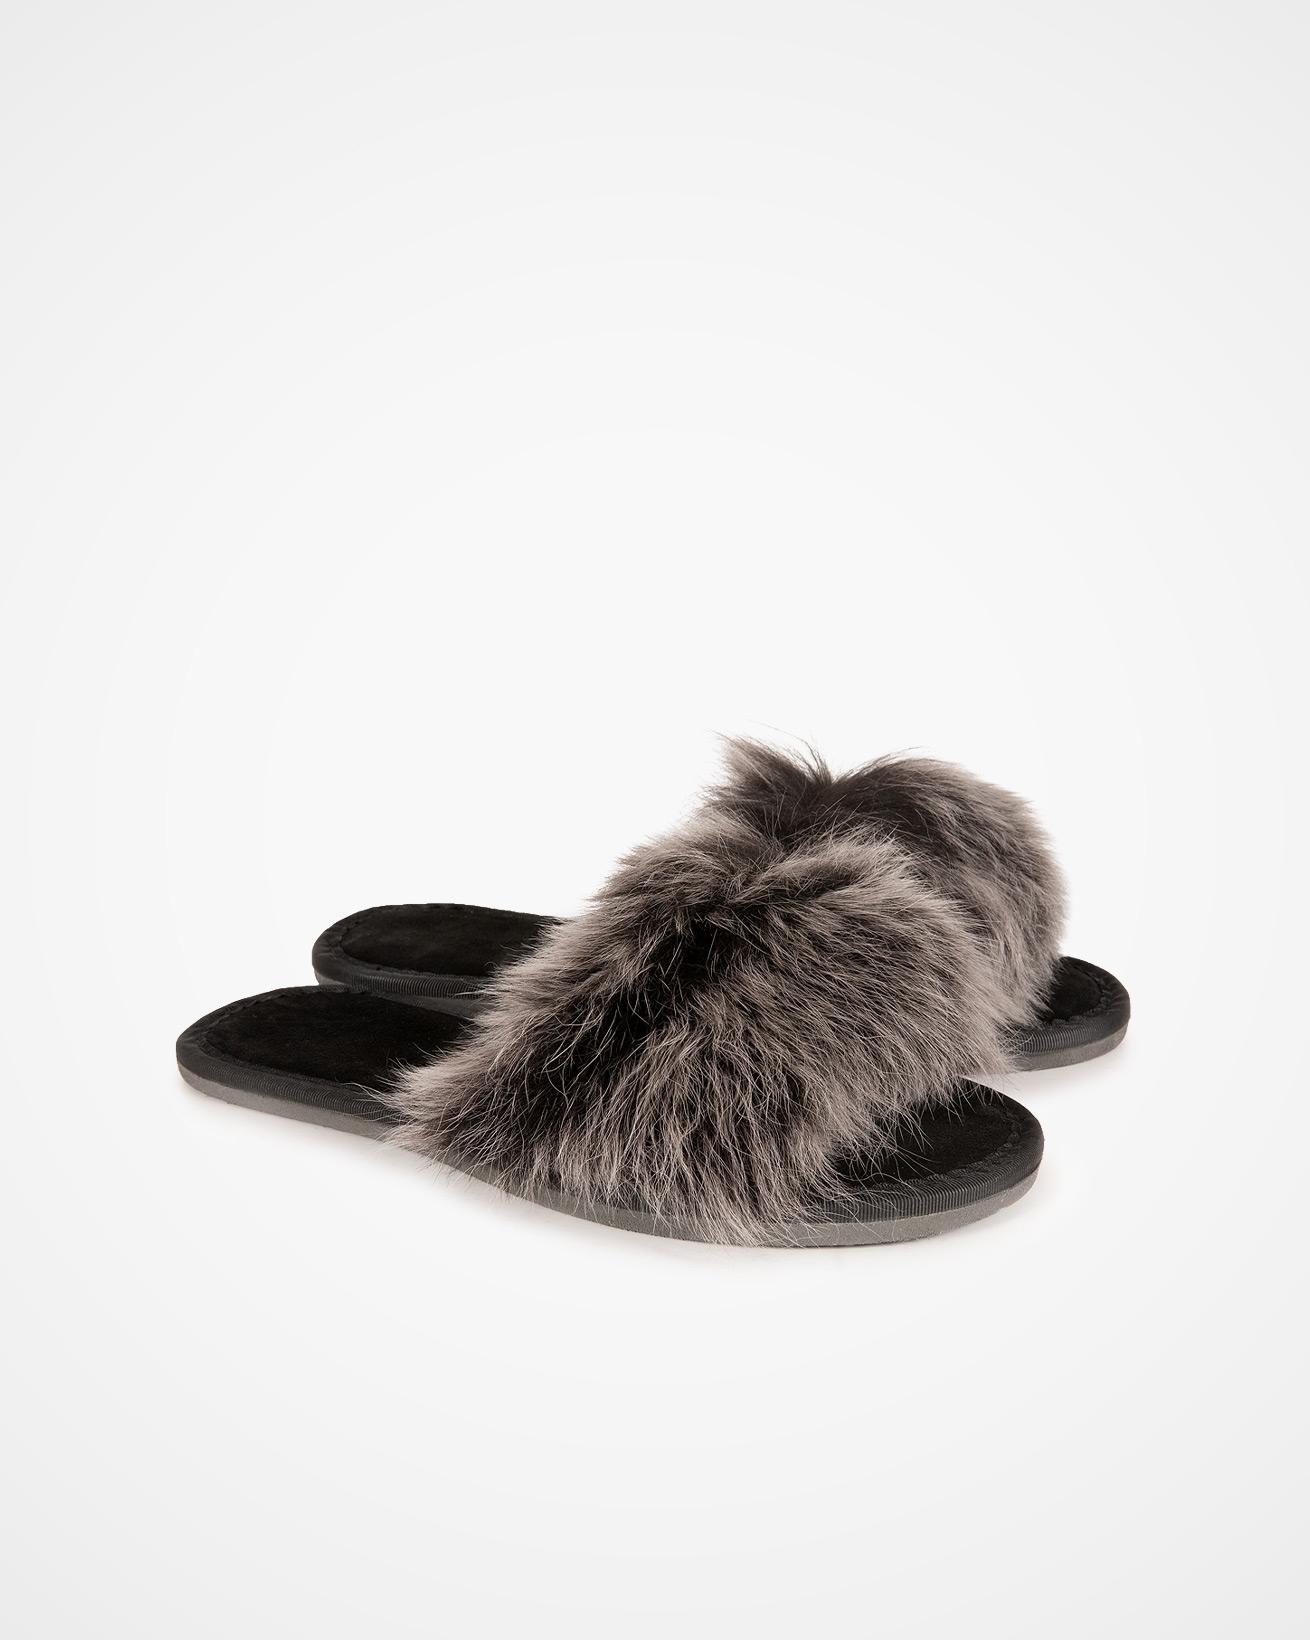 Toscana Slides - Size 5 - Ebony Snow Tip - 2033